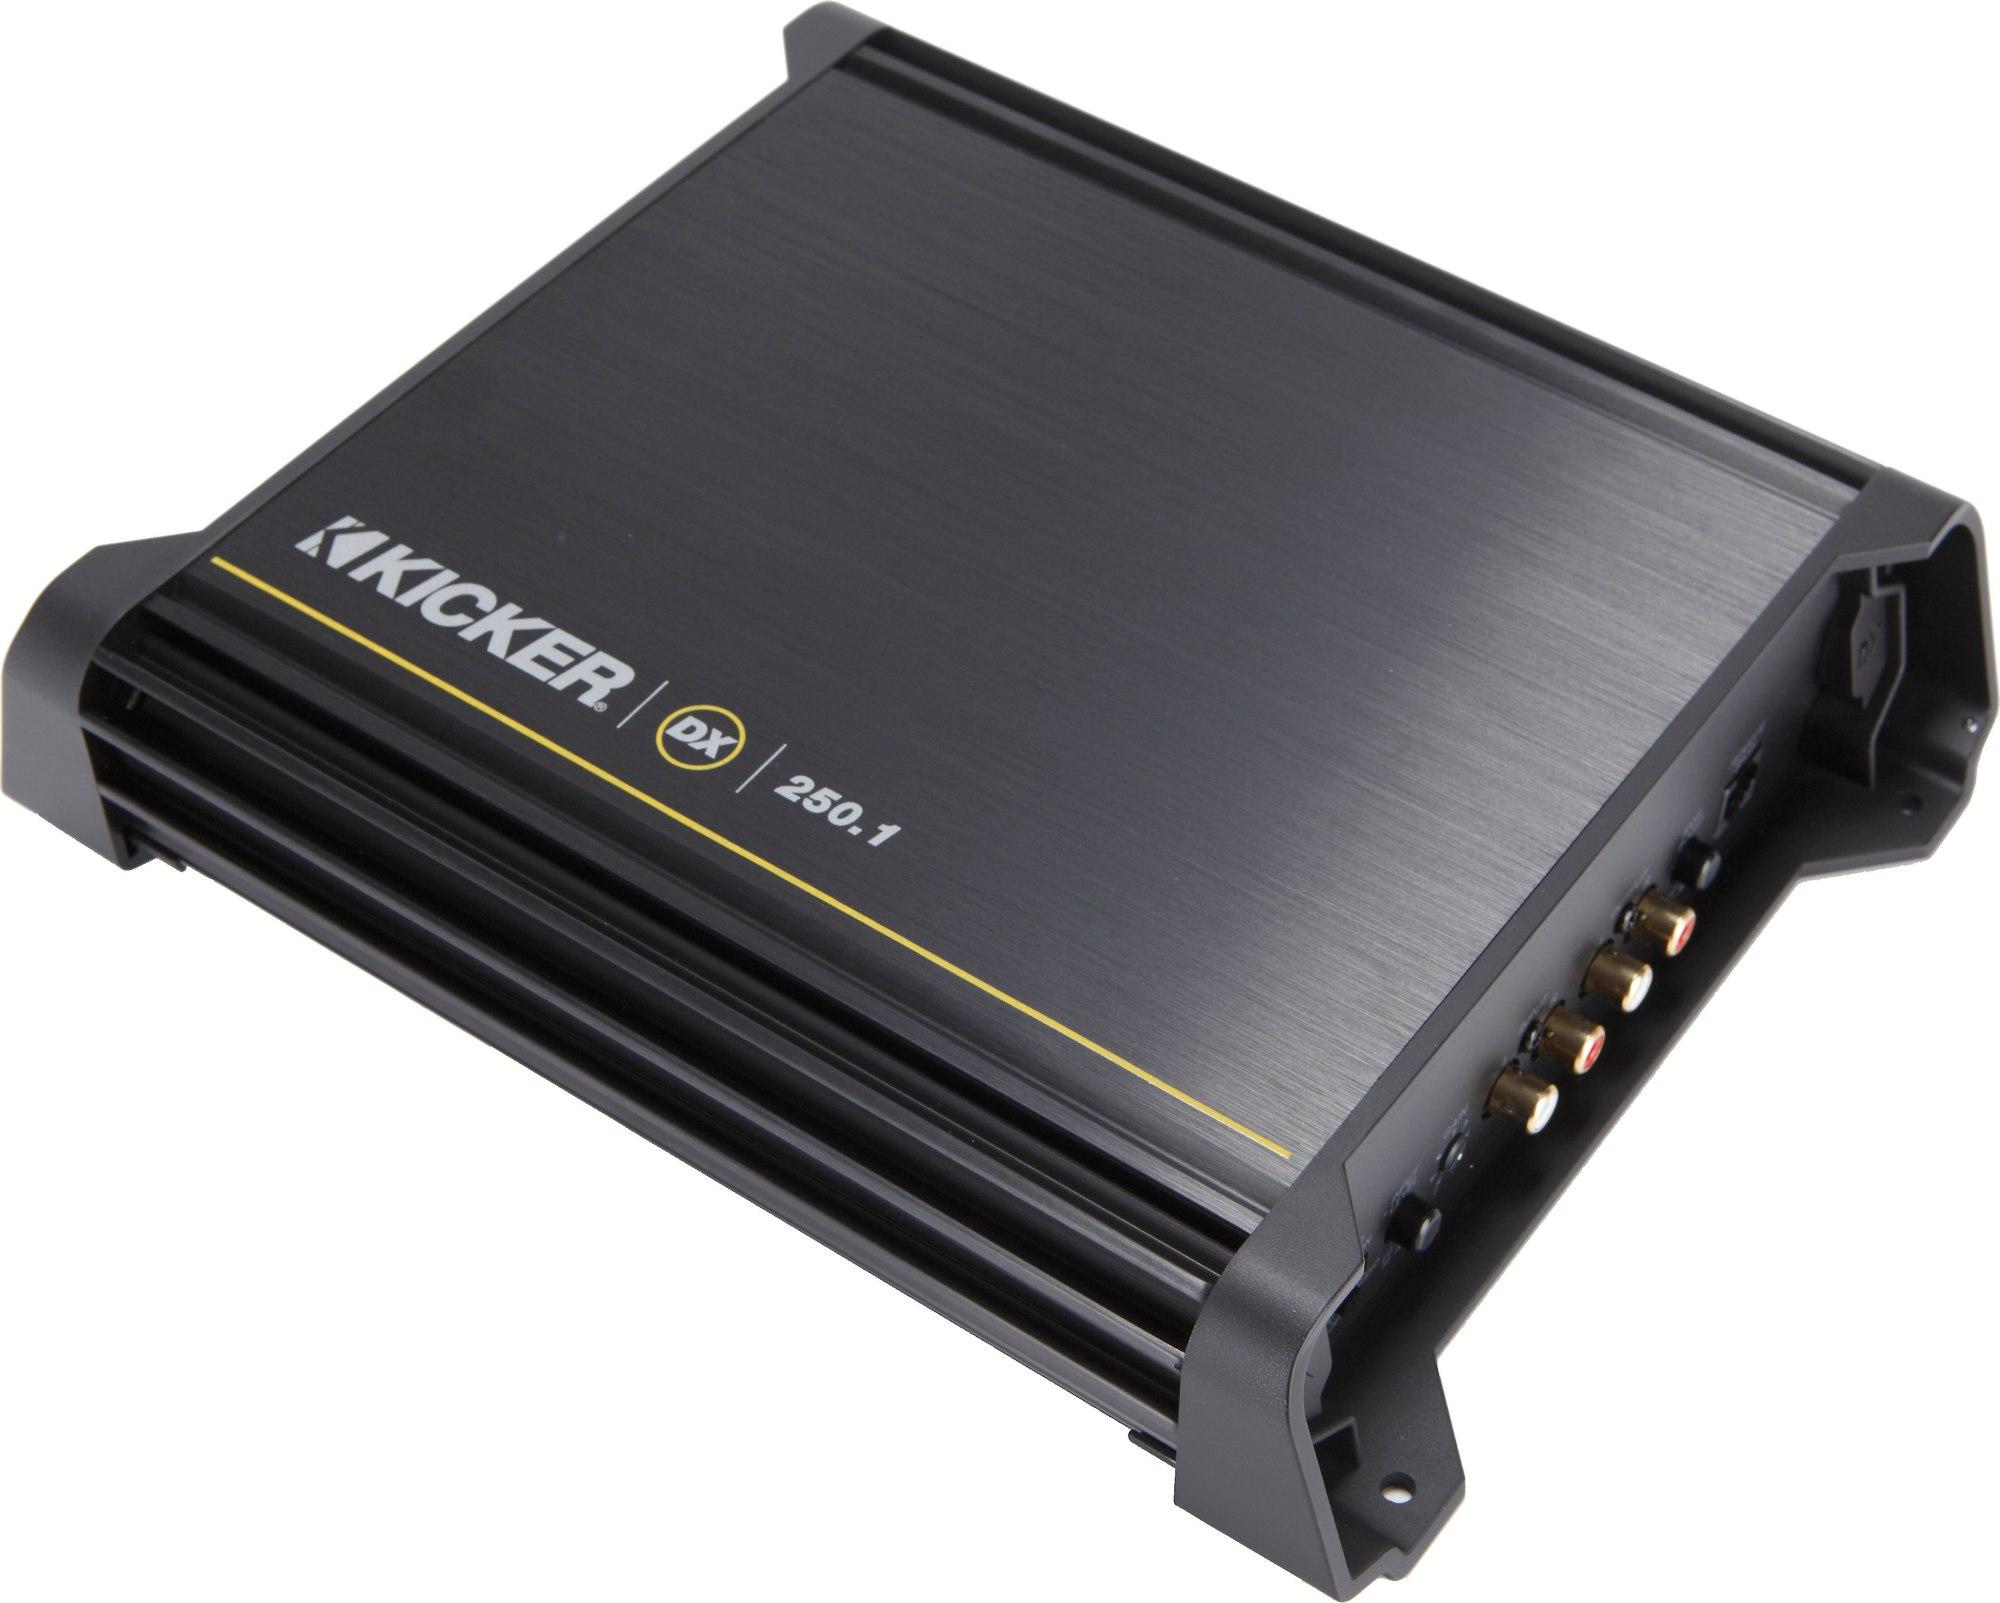 hight resolution of kicker 11dx250 1 mono subwoofer amplifier 250 watts rms x 1 at 2 kicker dx 250 1 wiring diagram